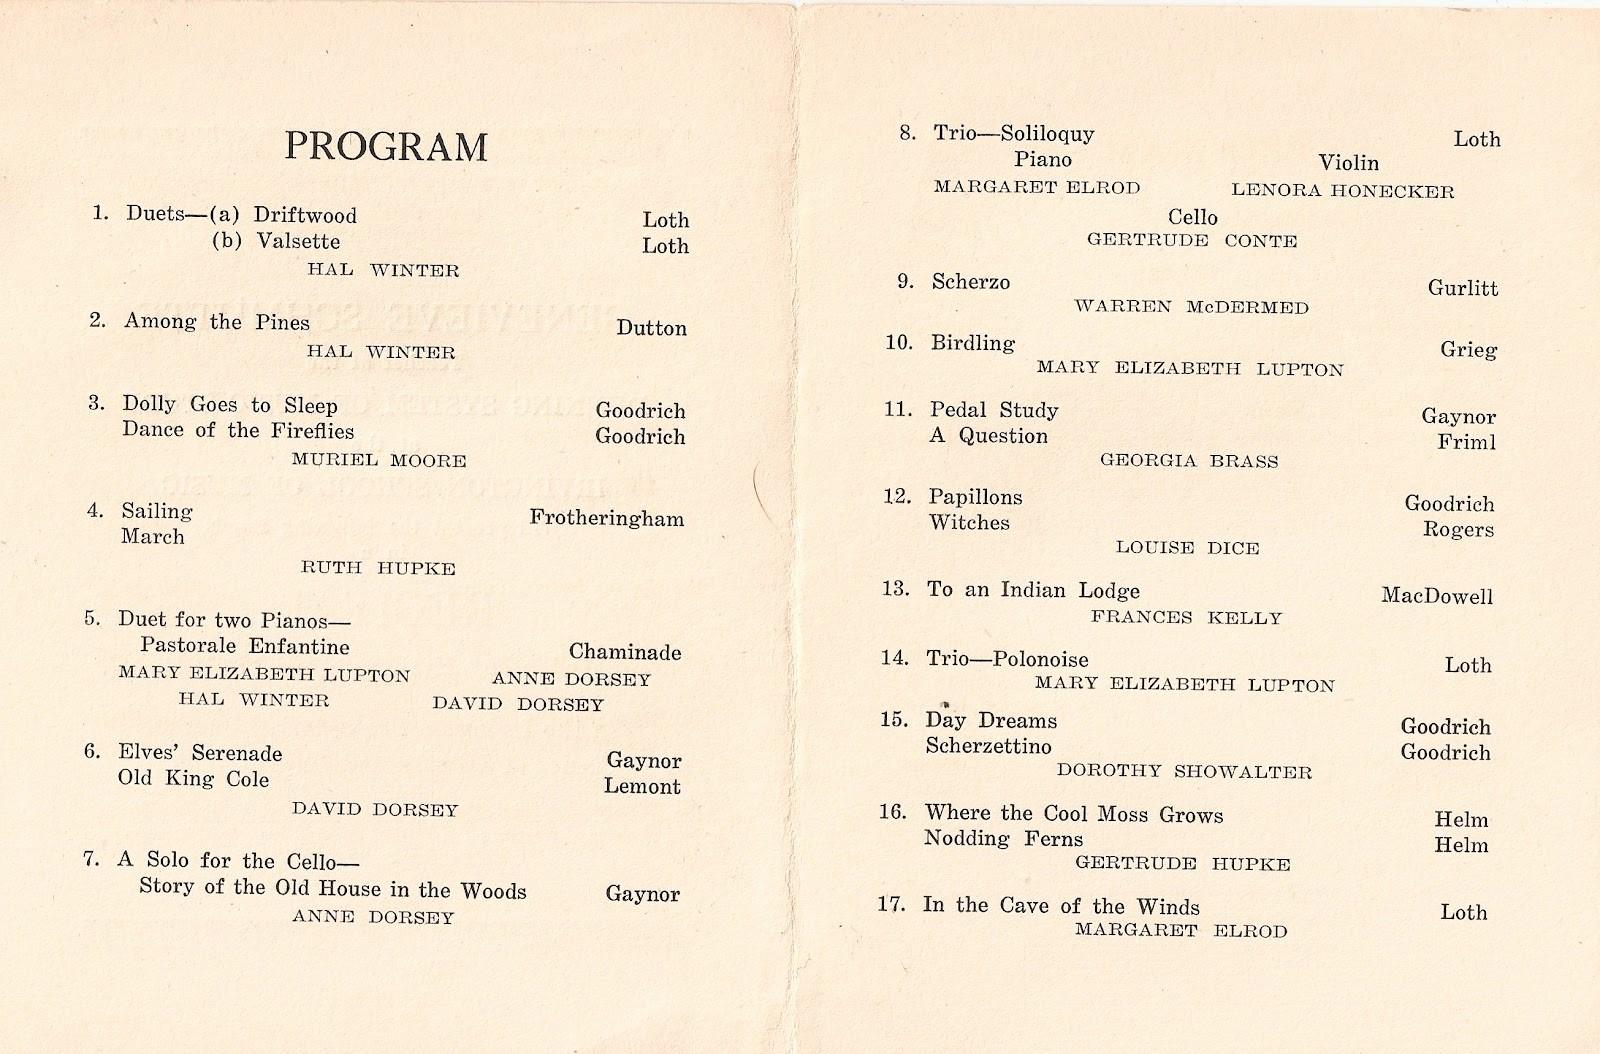 Piano Recital Program Template Free Best Of Music Recital Program Templates Free Colesecolossus